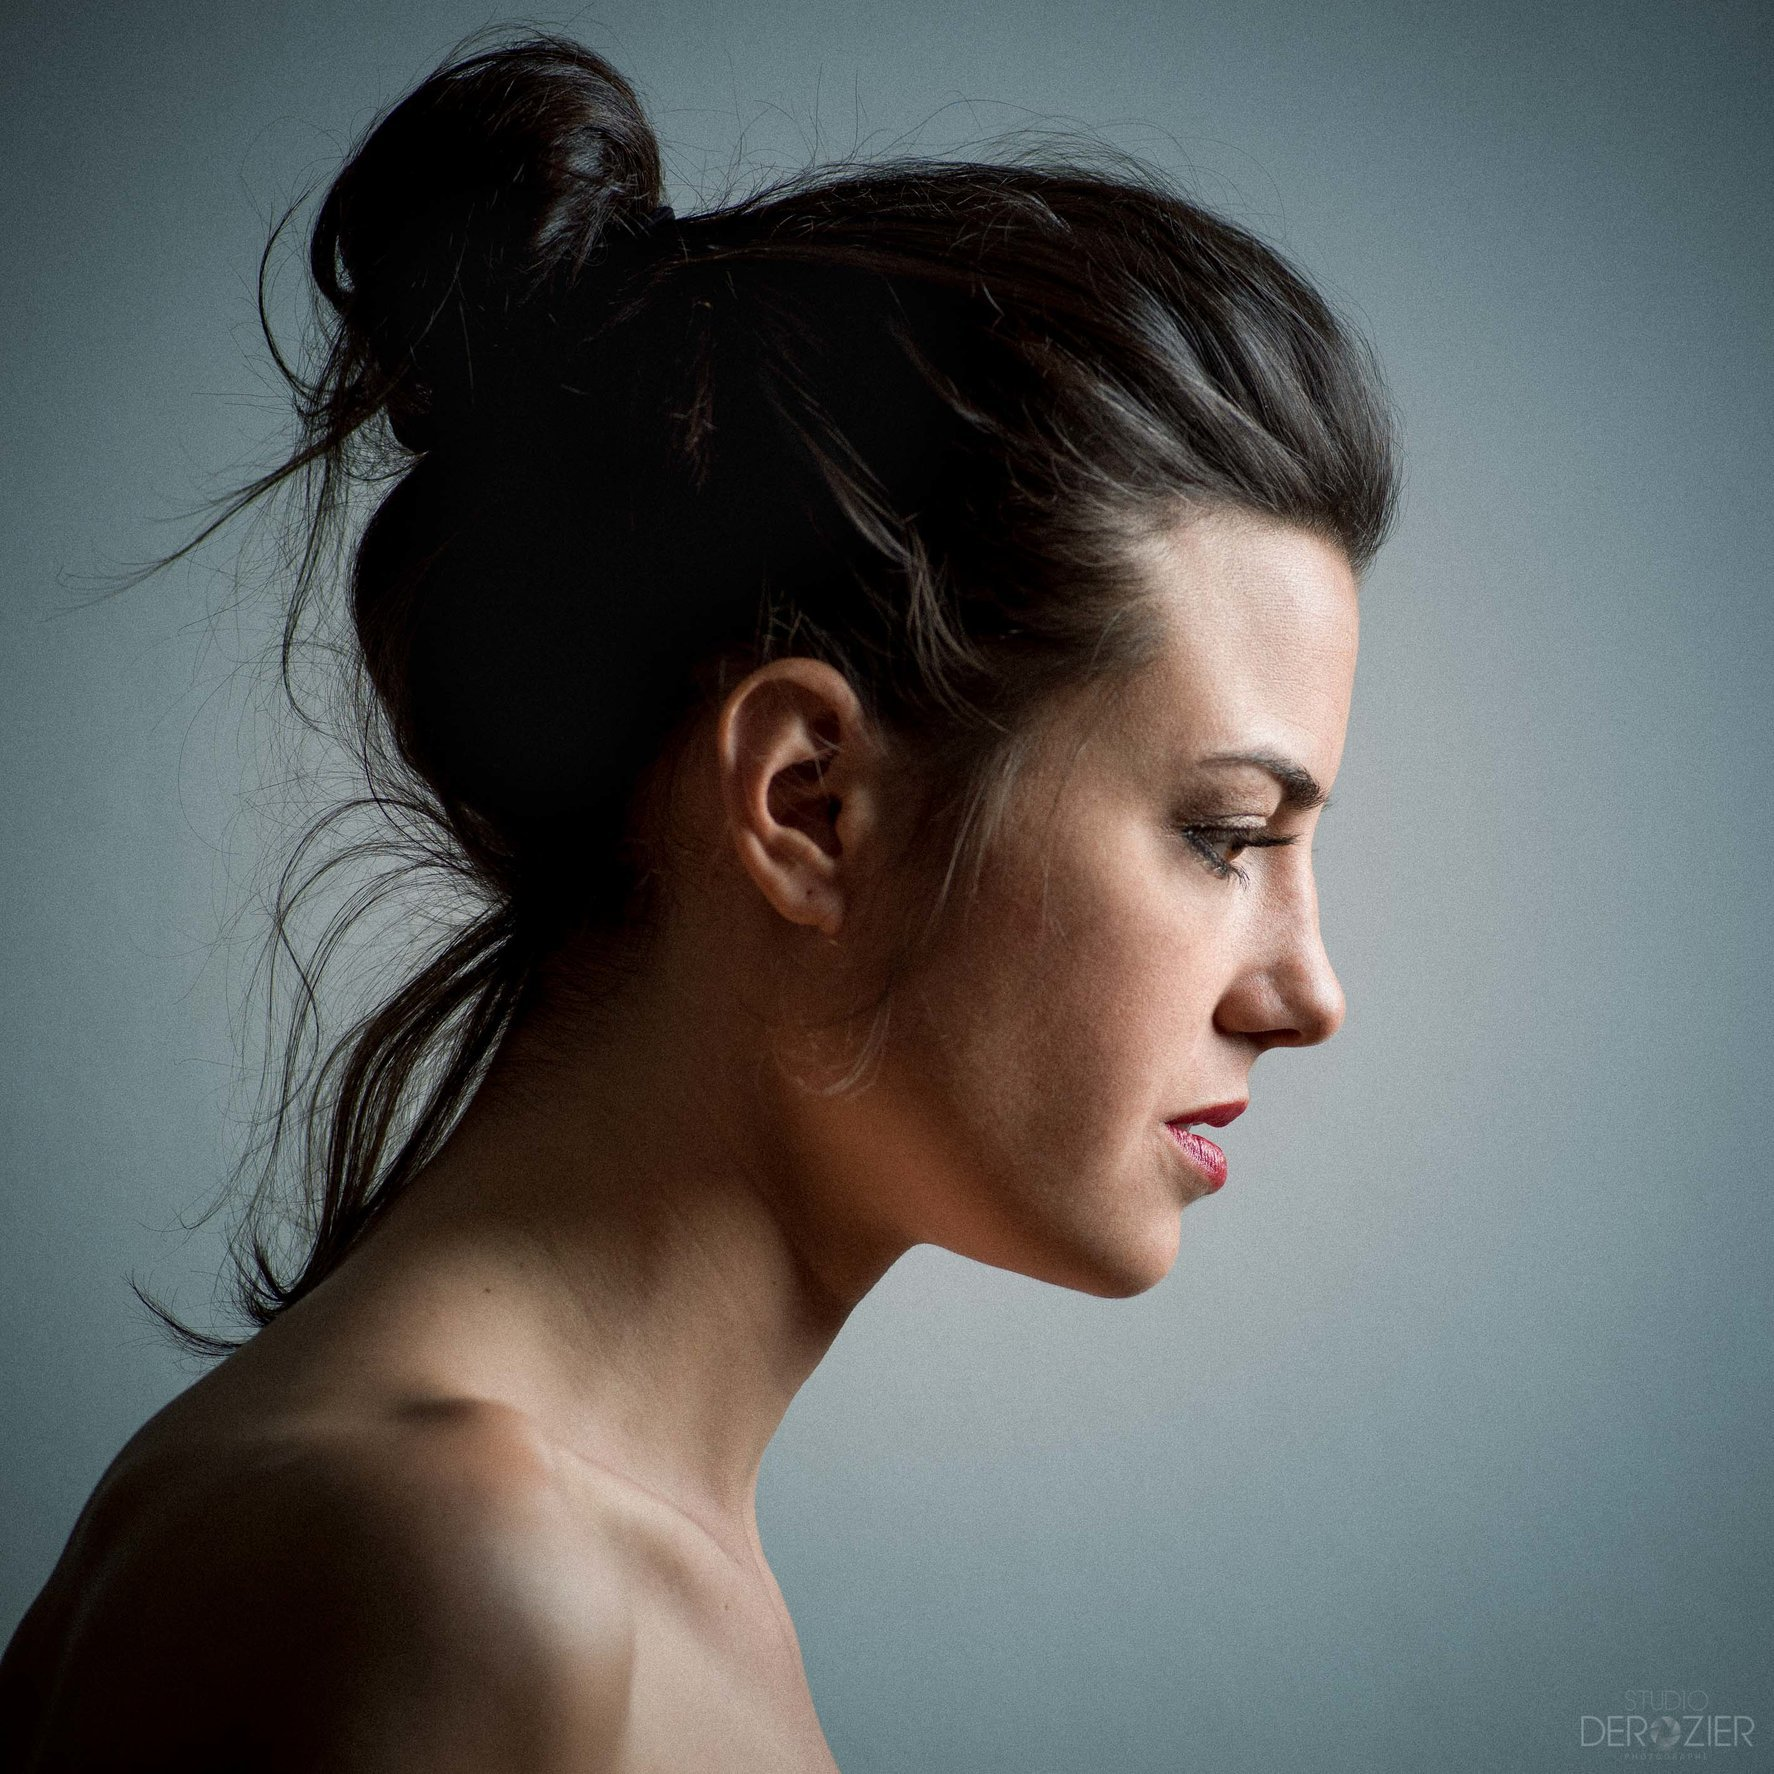 photographe  u00e0 tarbes - studio derozier - portrait